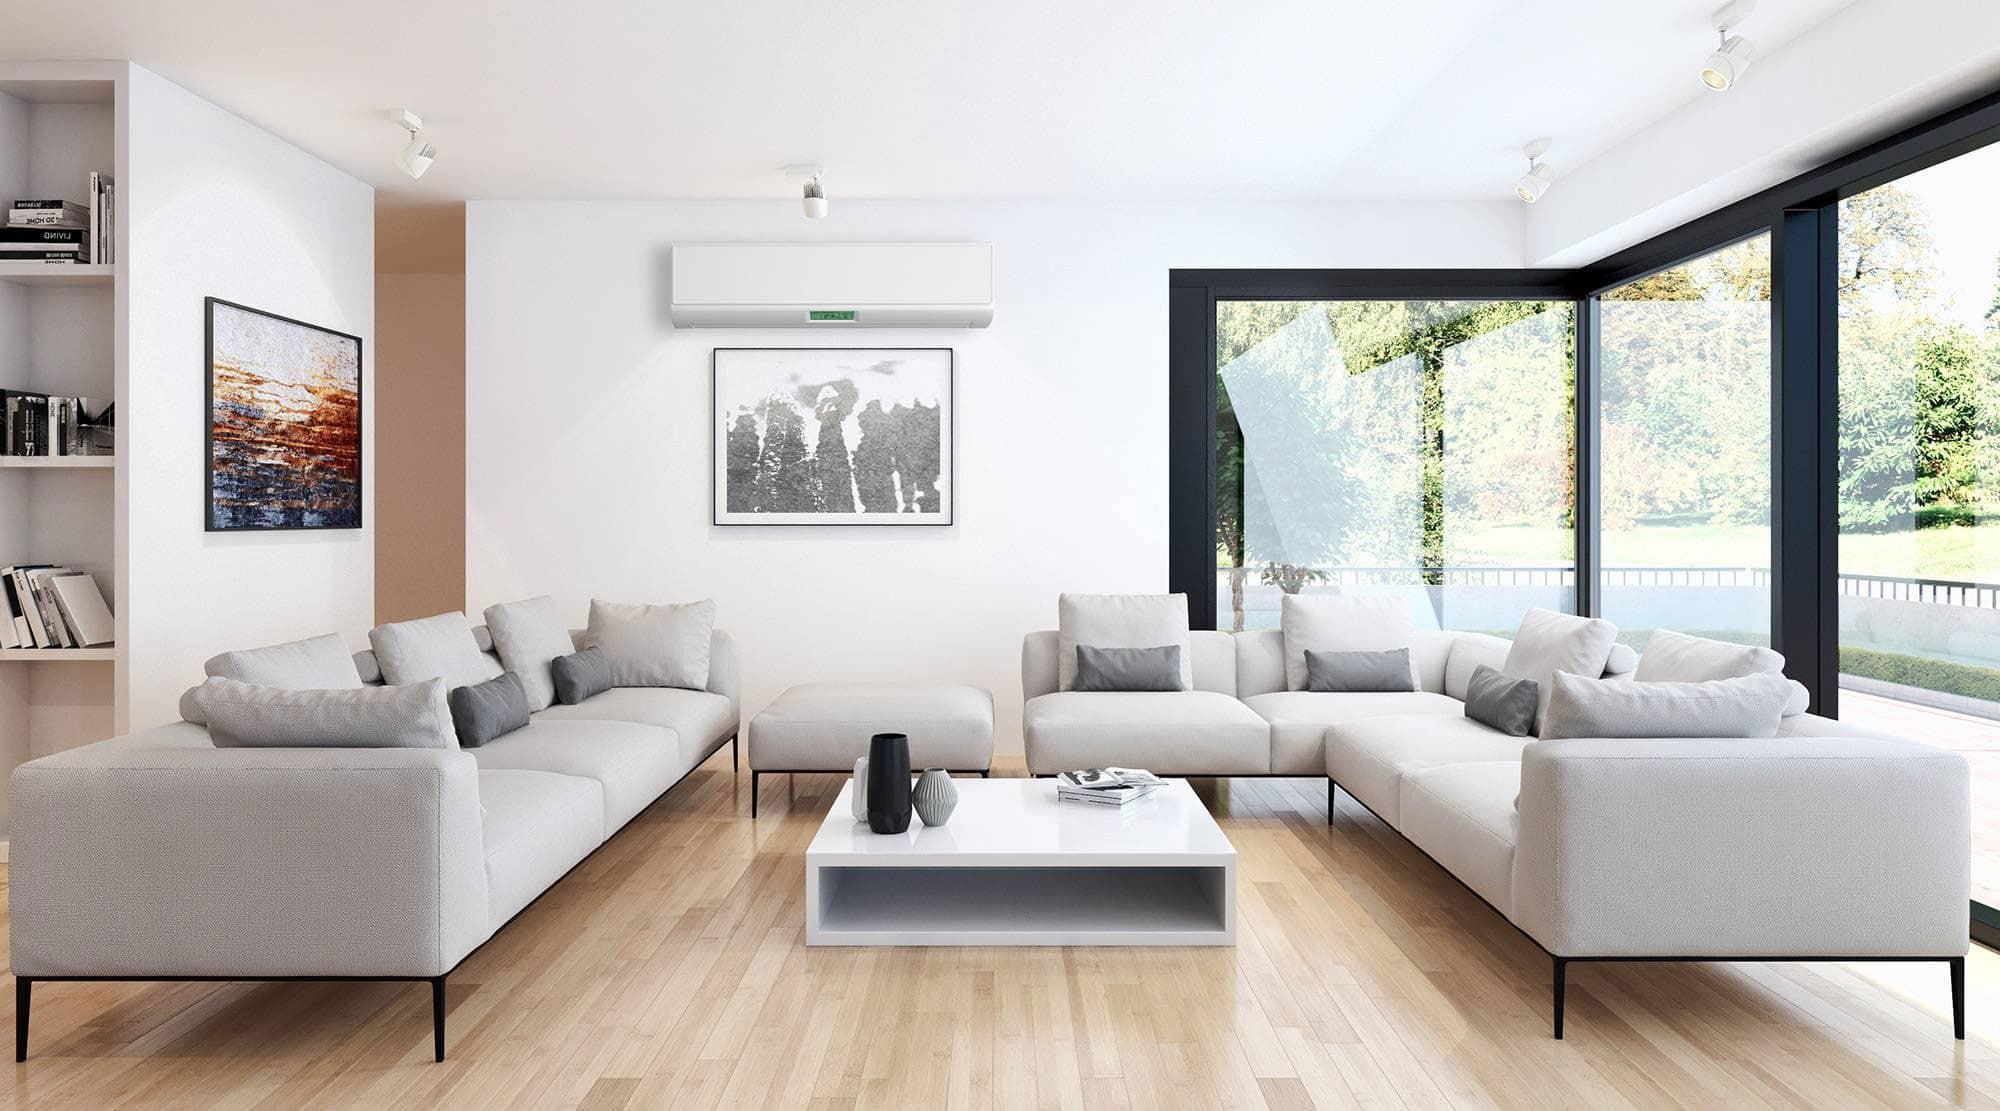 r 39 energies plombier chauffagiste cahors. Black Bedroom Furniture Sets. Home Design Ideas